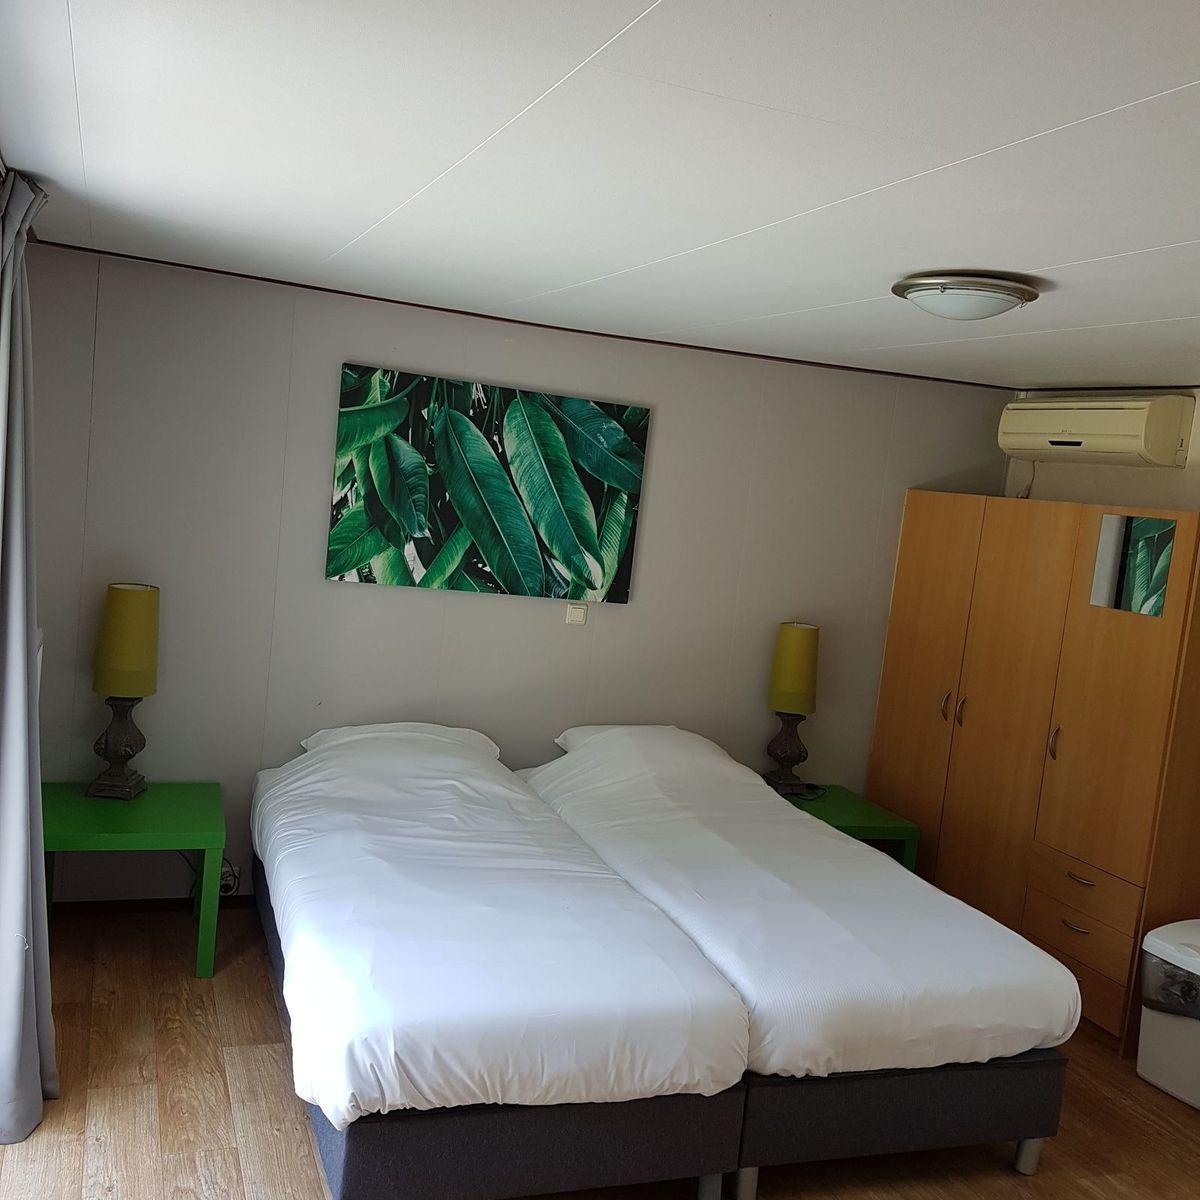 Chambres d'hôtel en chalet